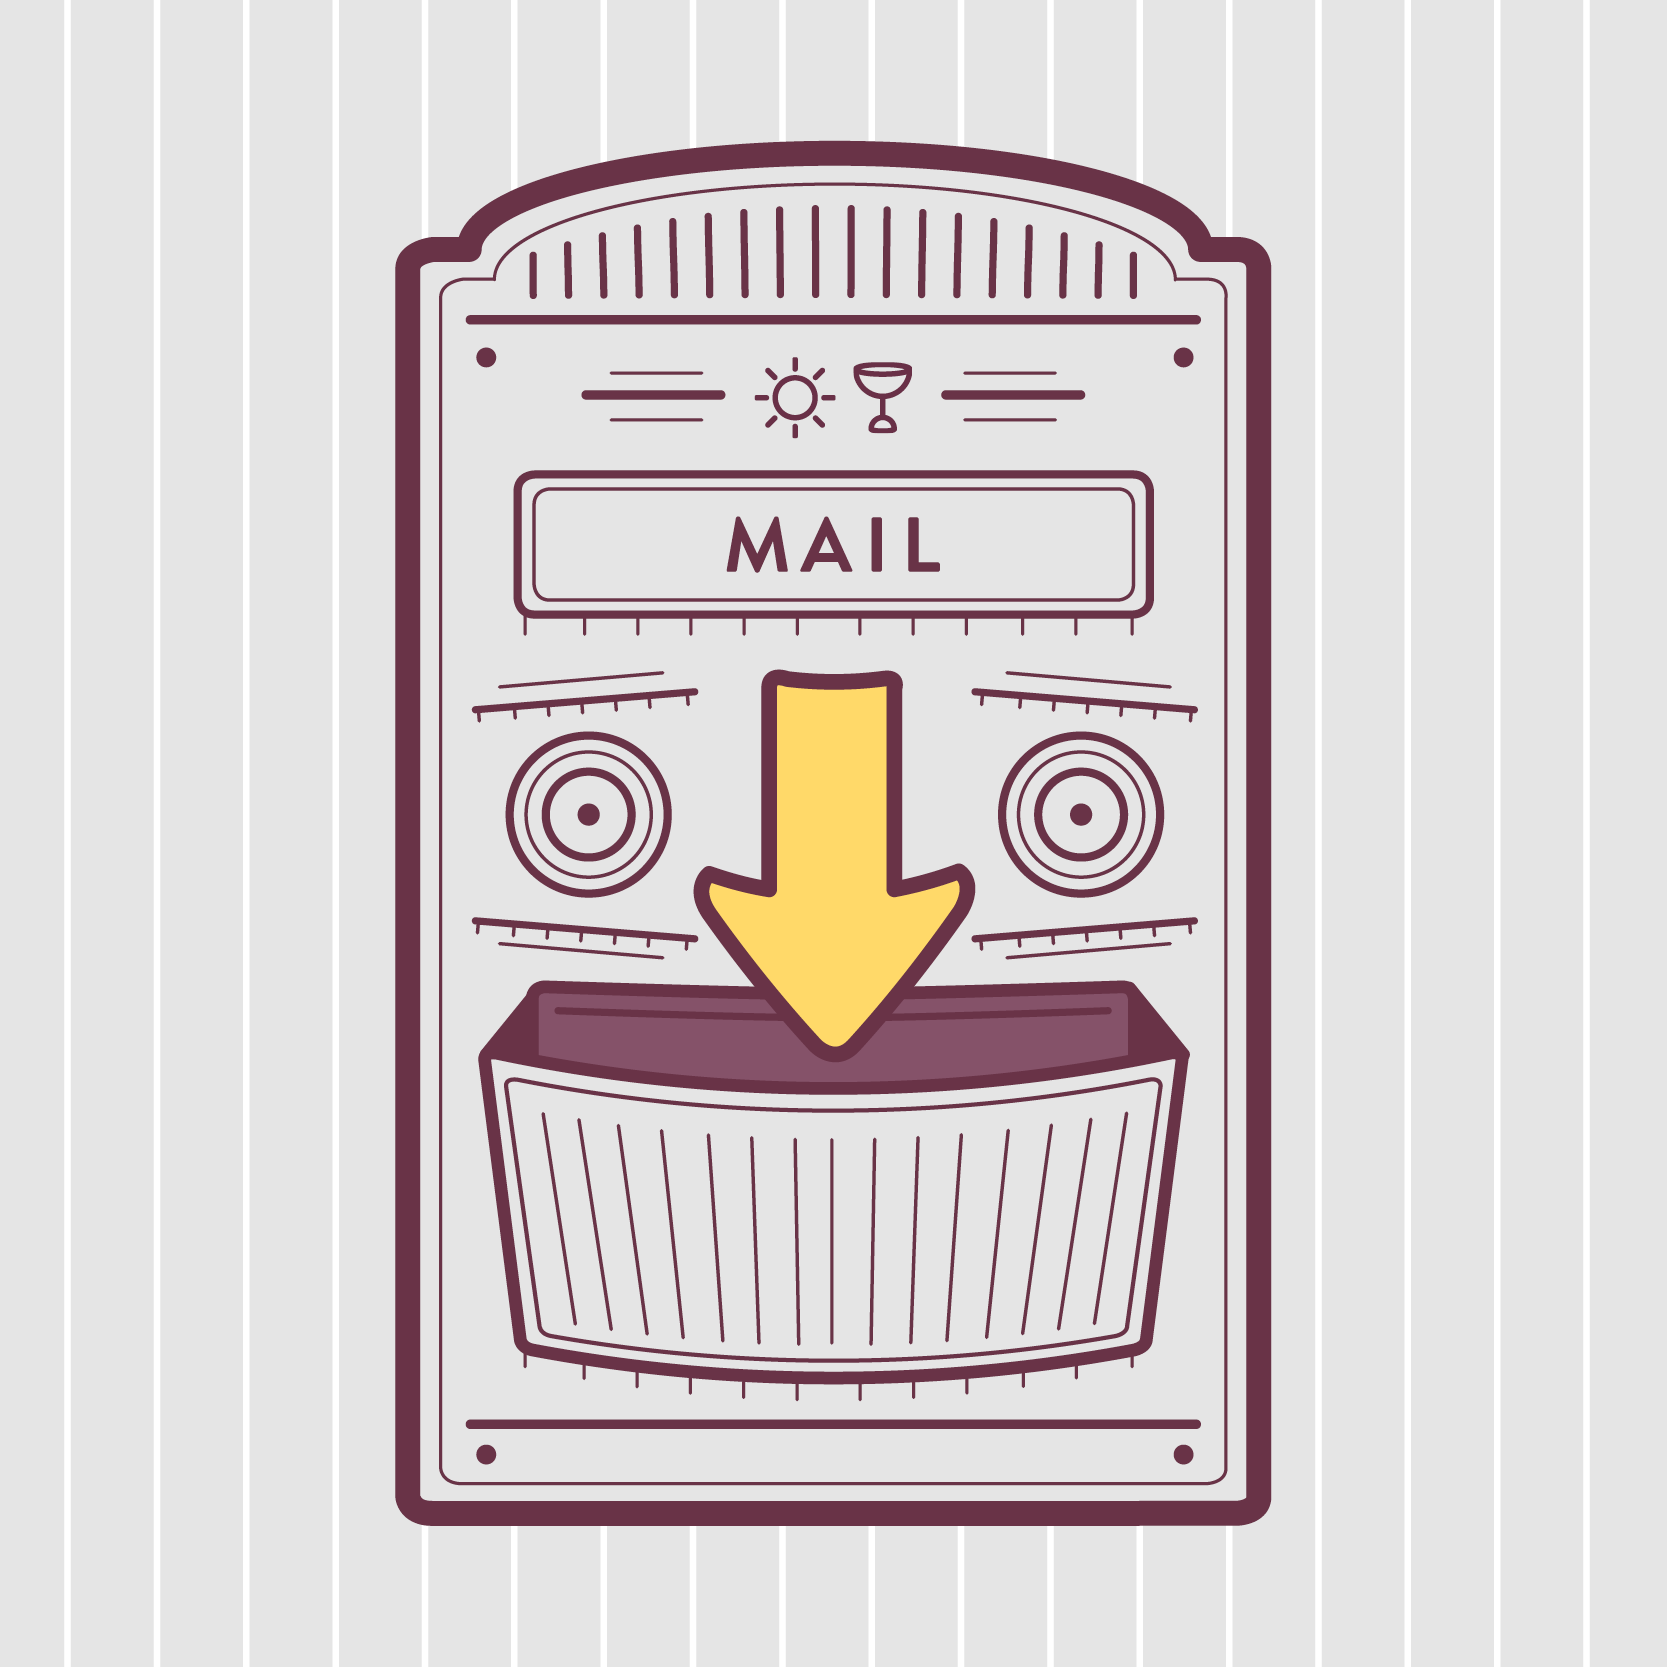 mailbox_01.png